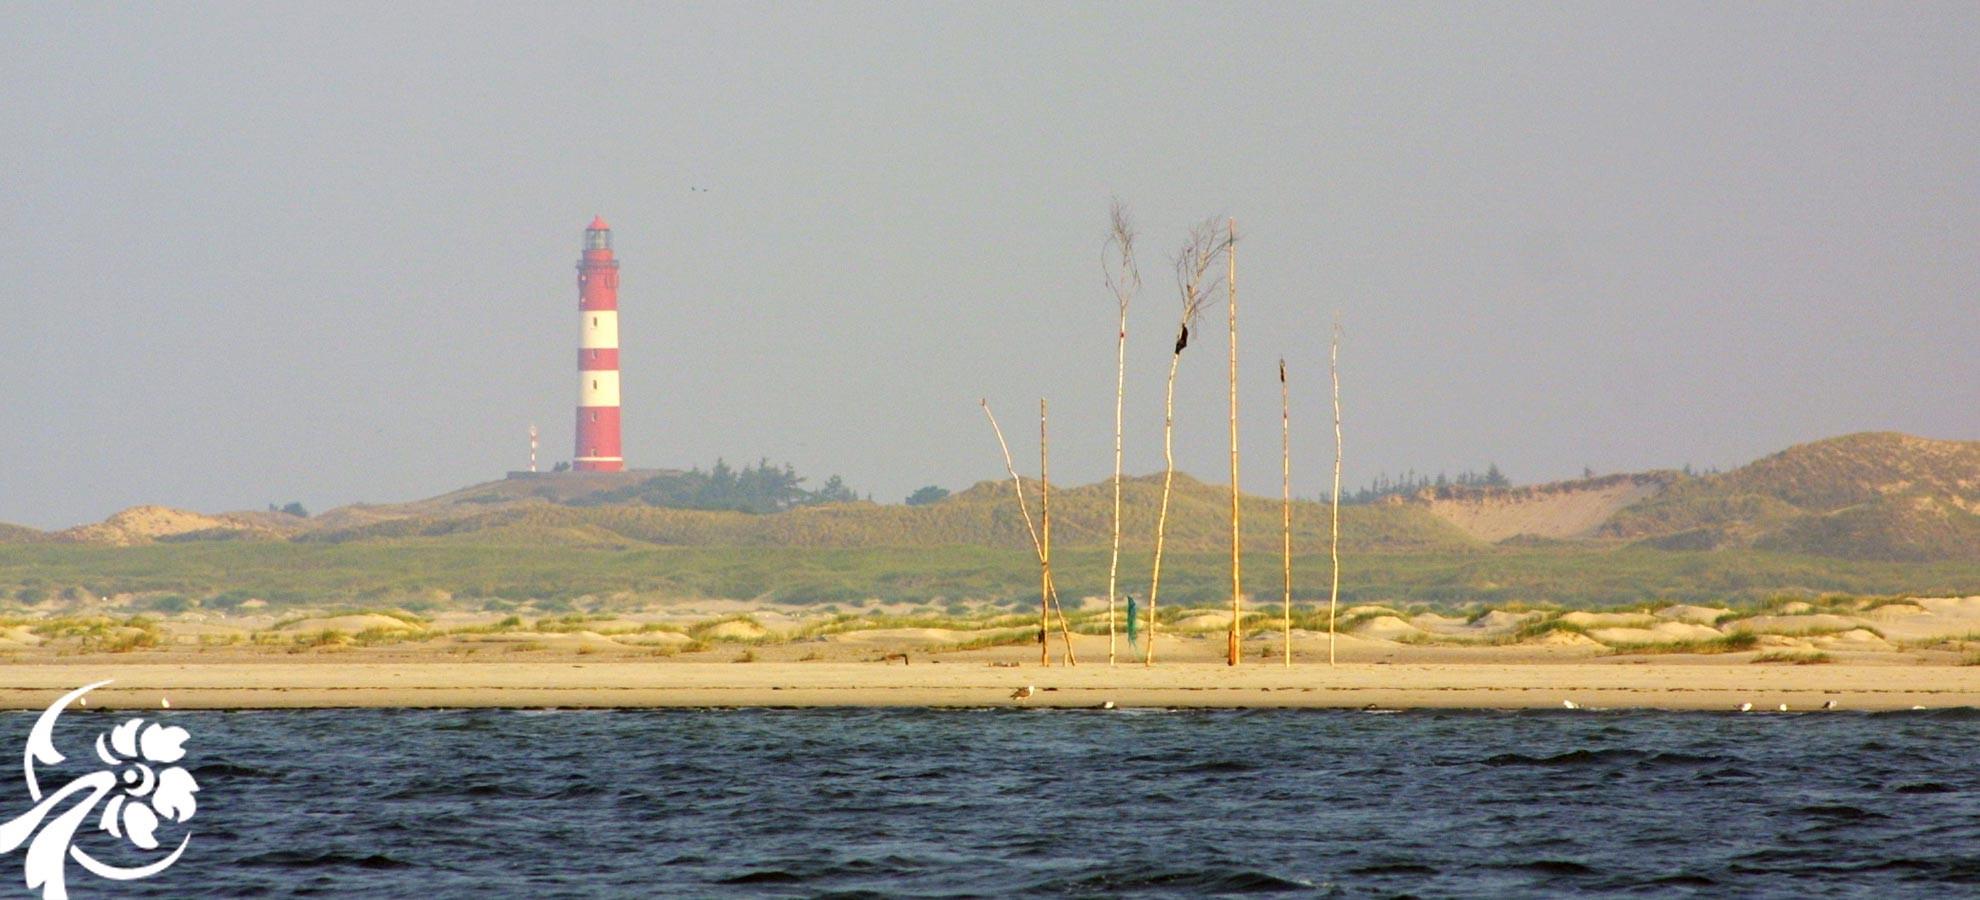 petersen-amrum-leuchtturm